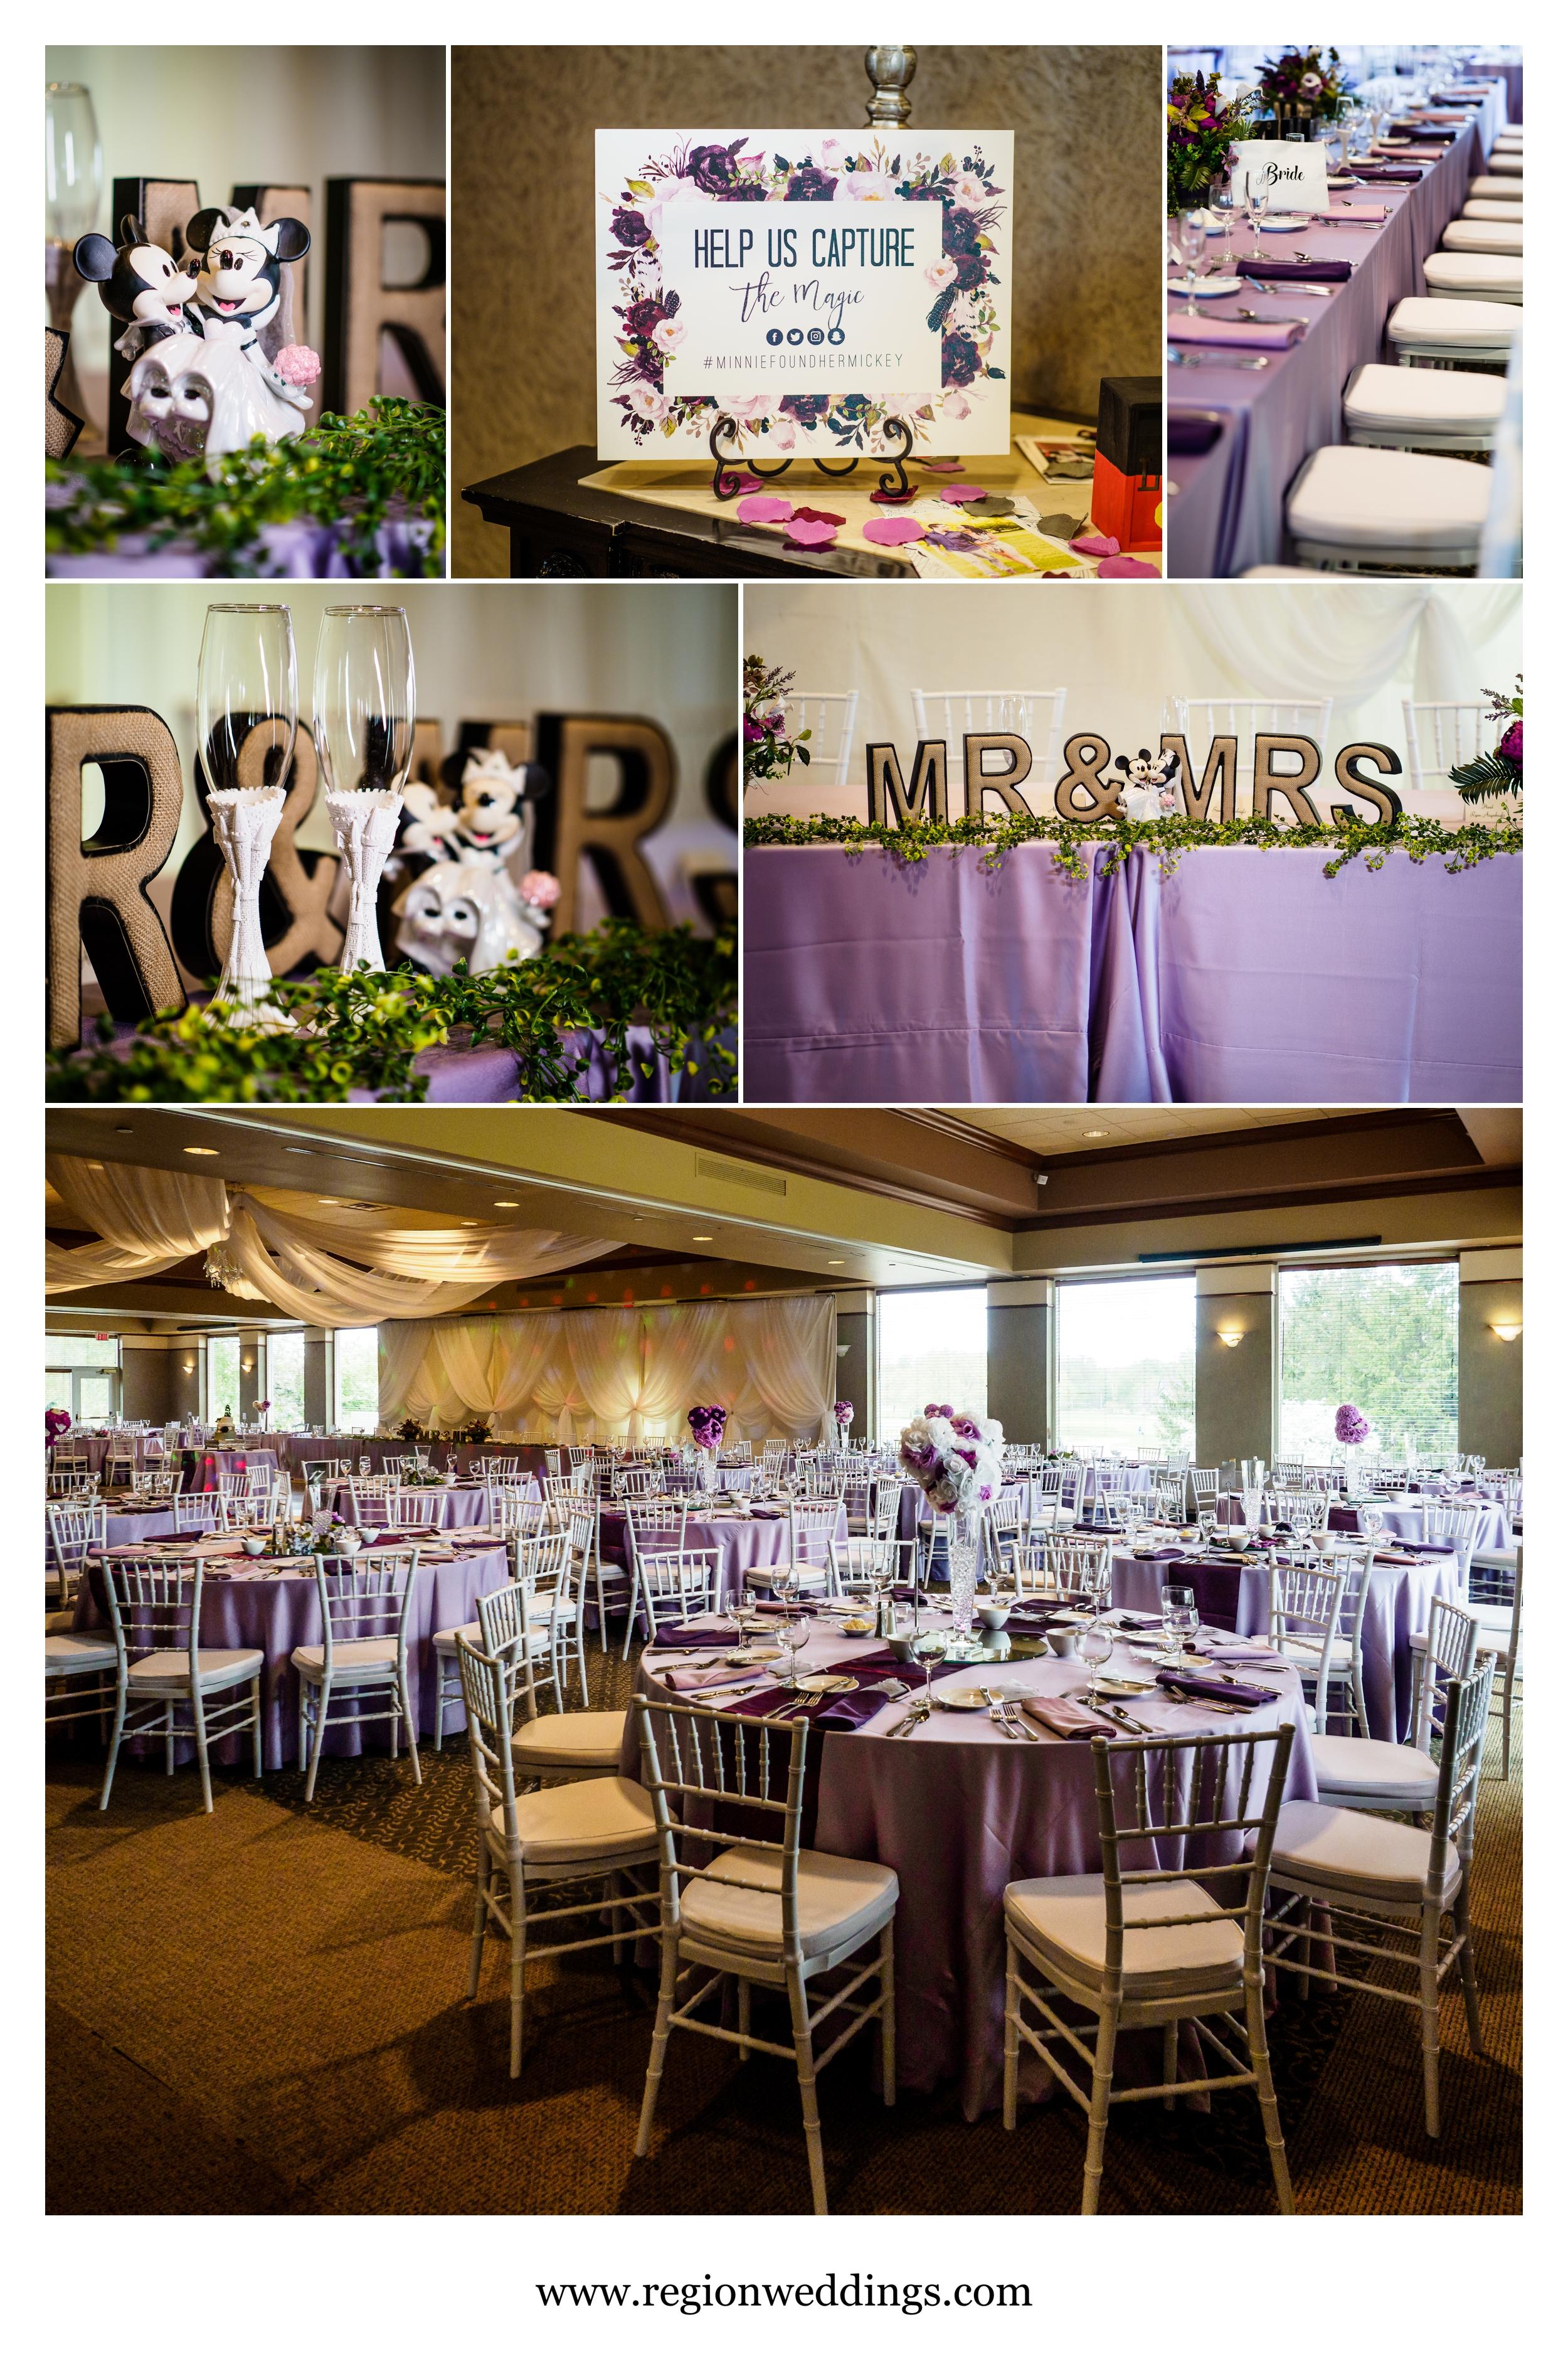 A Disney inspired wedding reception at Sand Creek Country Club.